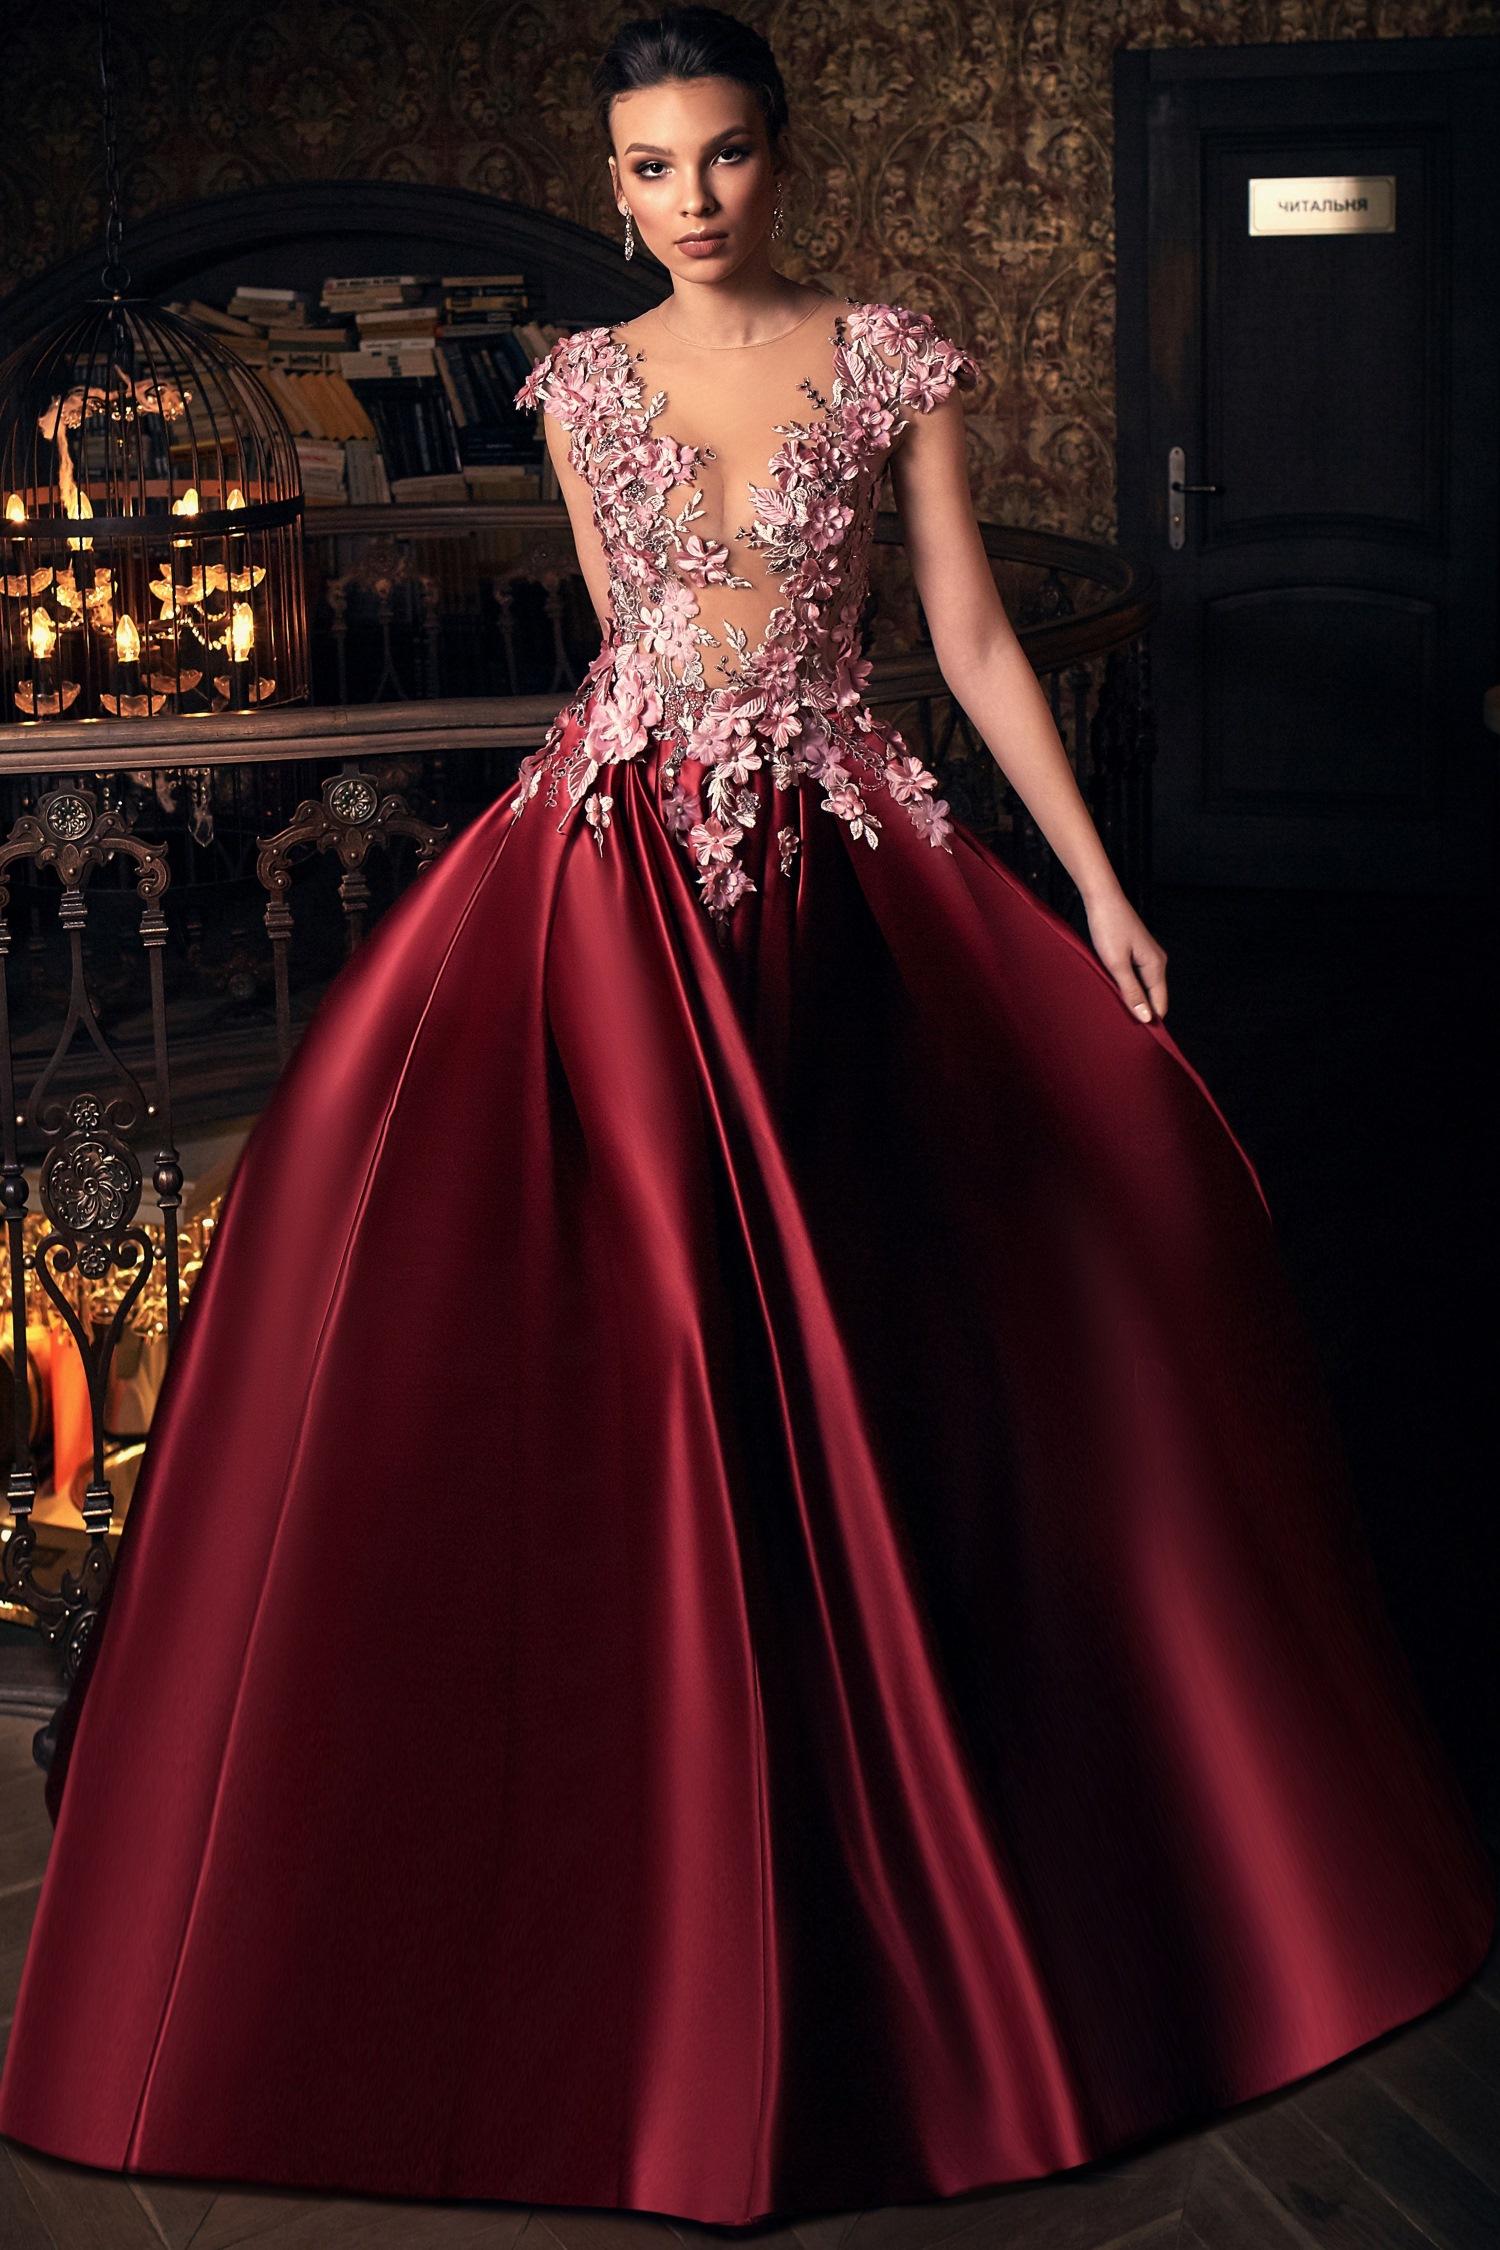 robe de soirée luxe rose satin duchesse